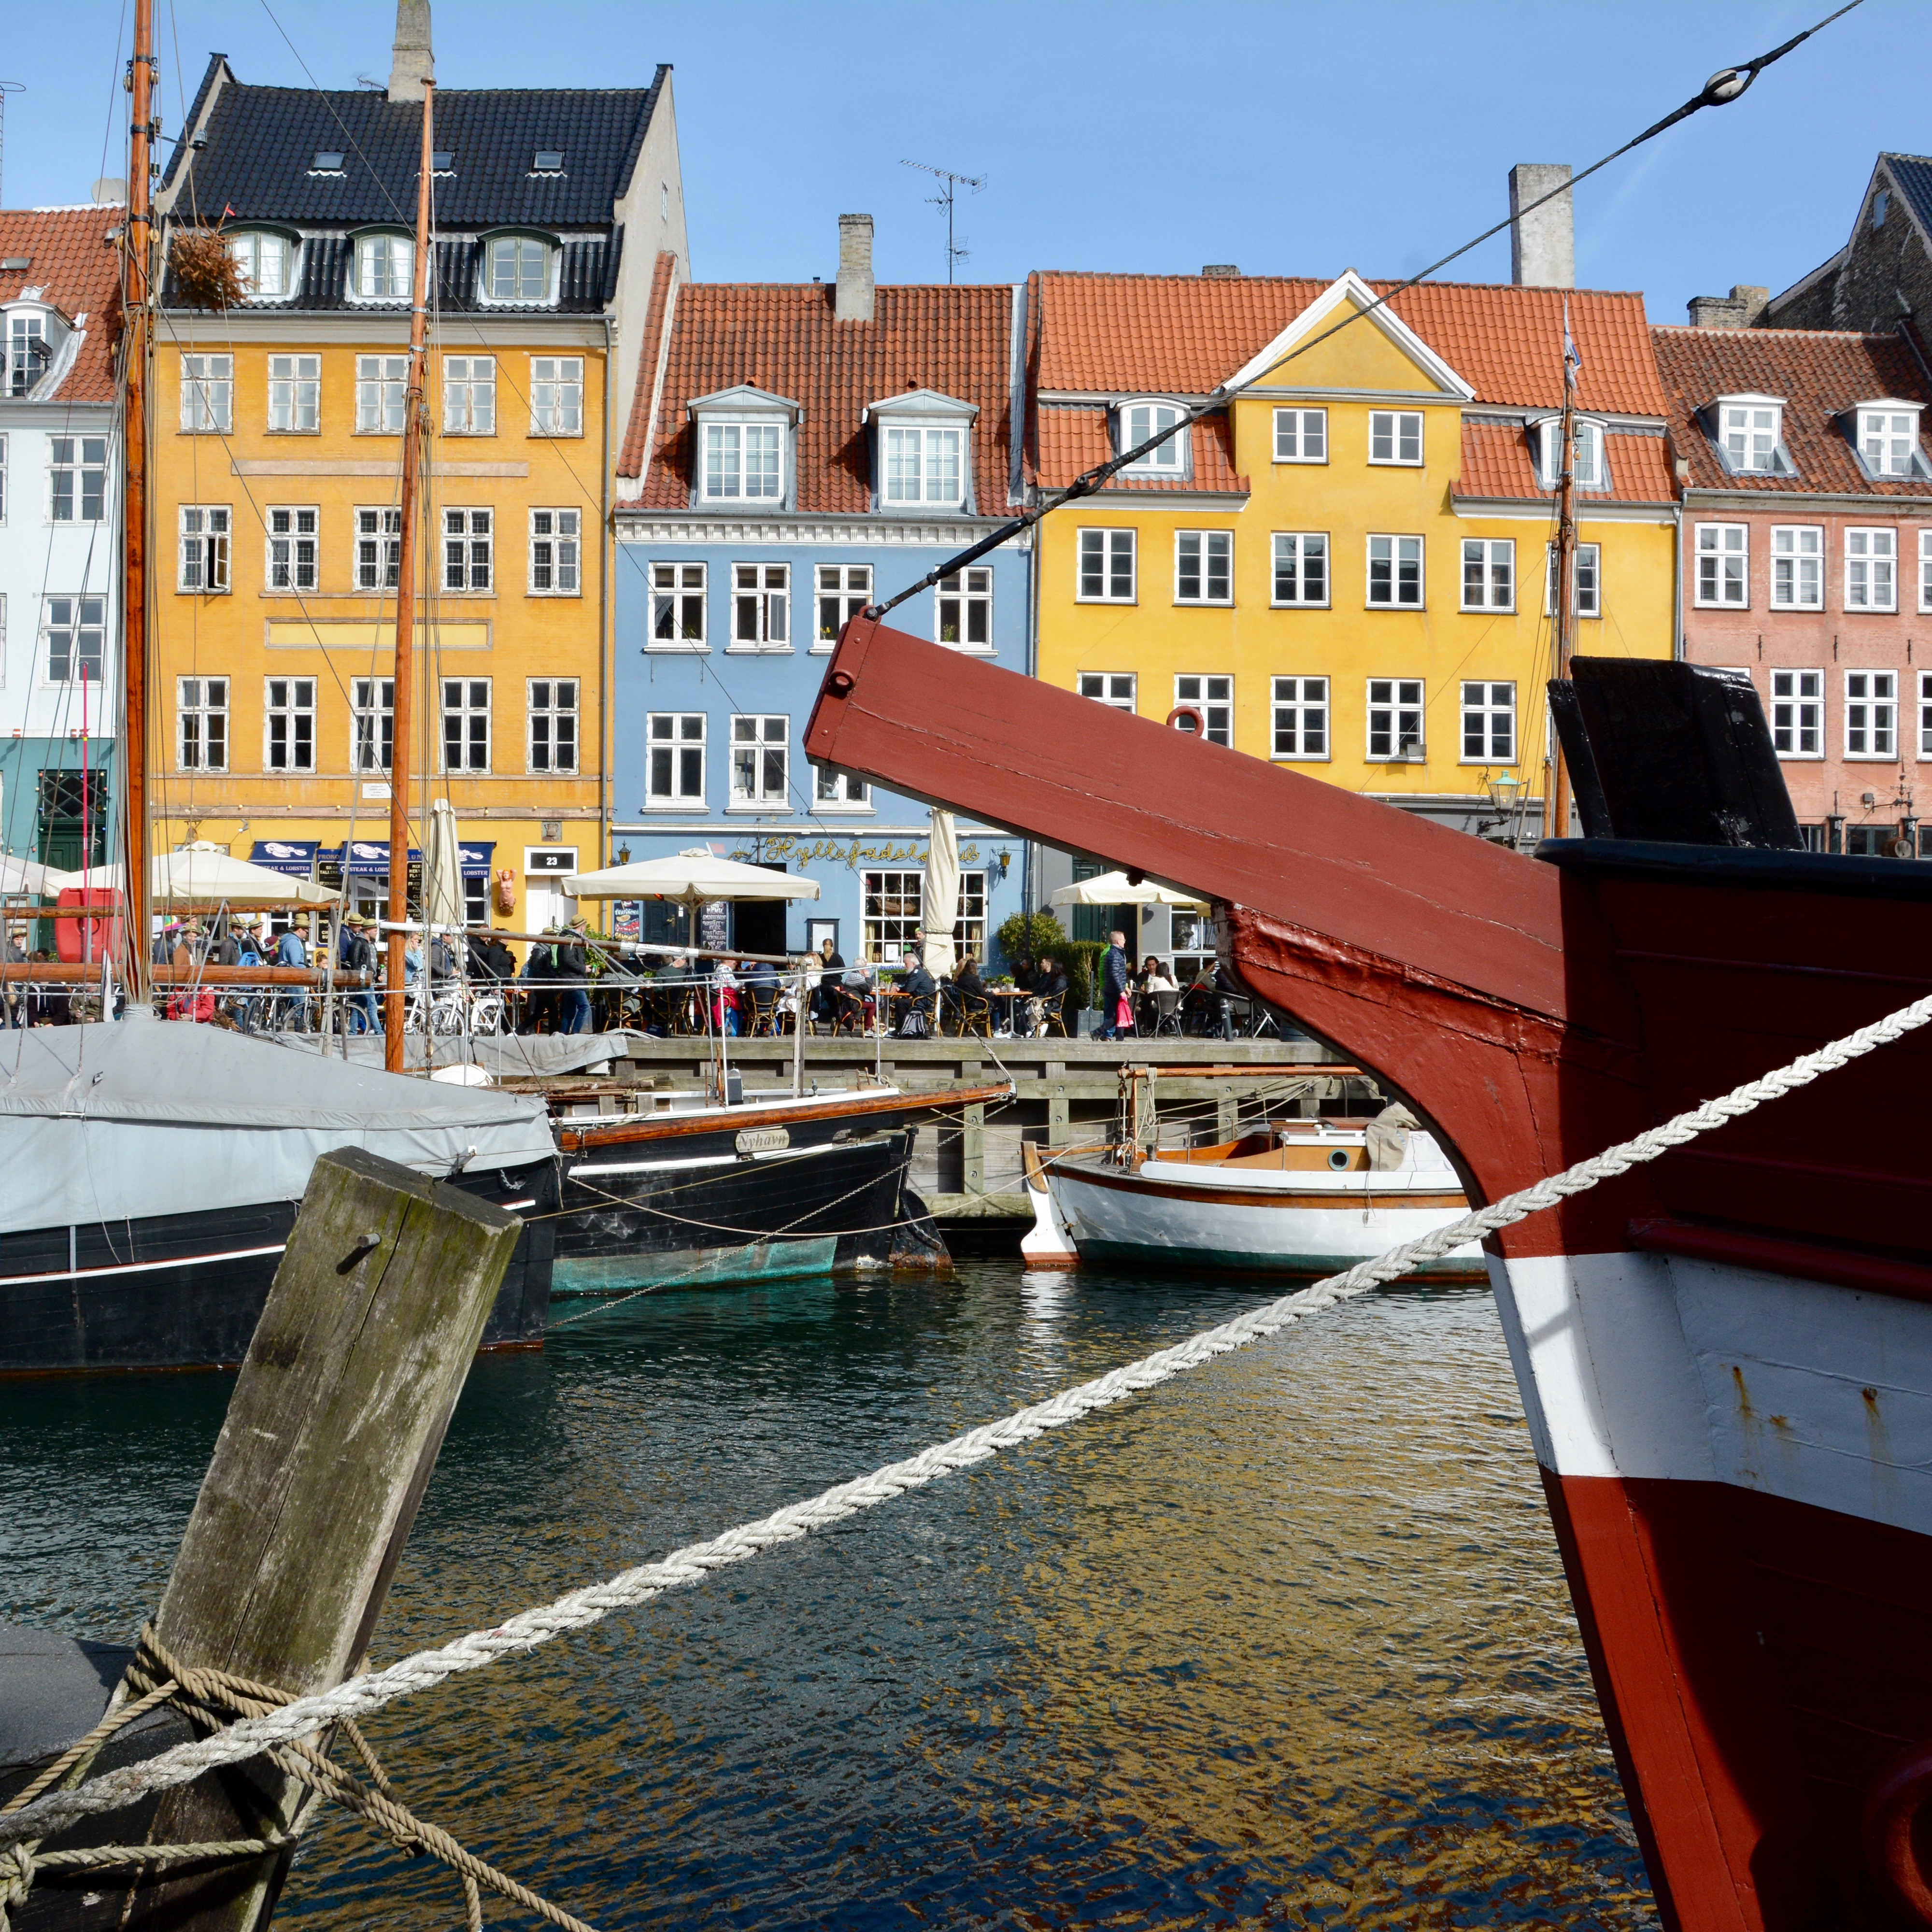 travel with kids children Copenhagen Denmark nyhavn canal boats